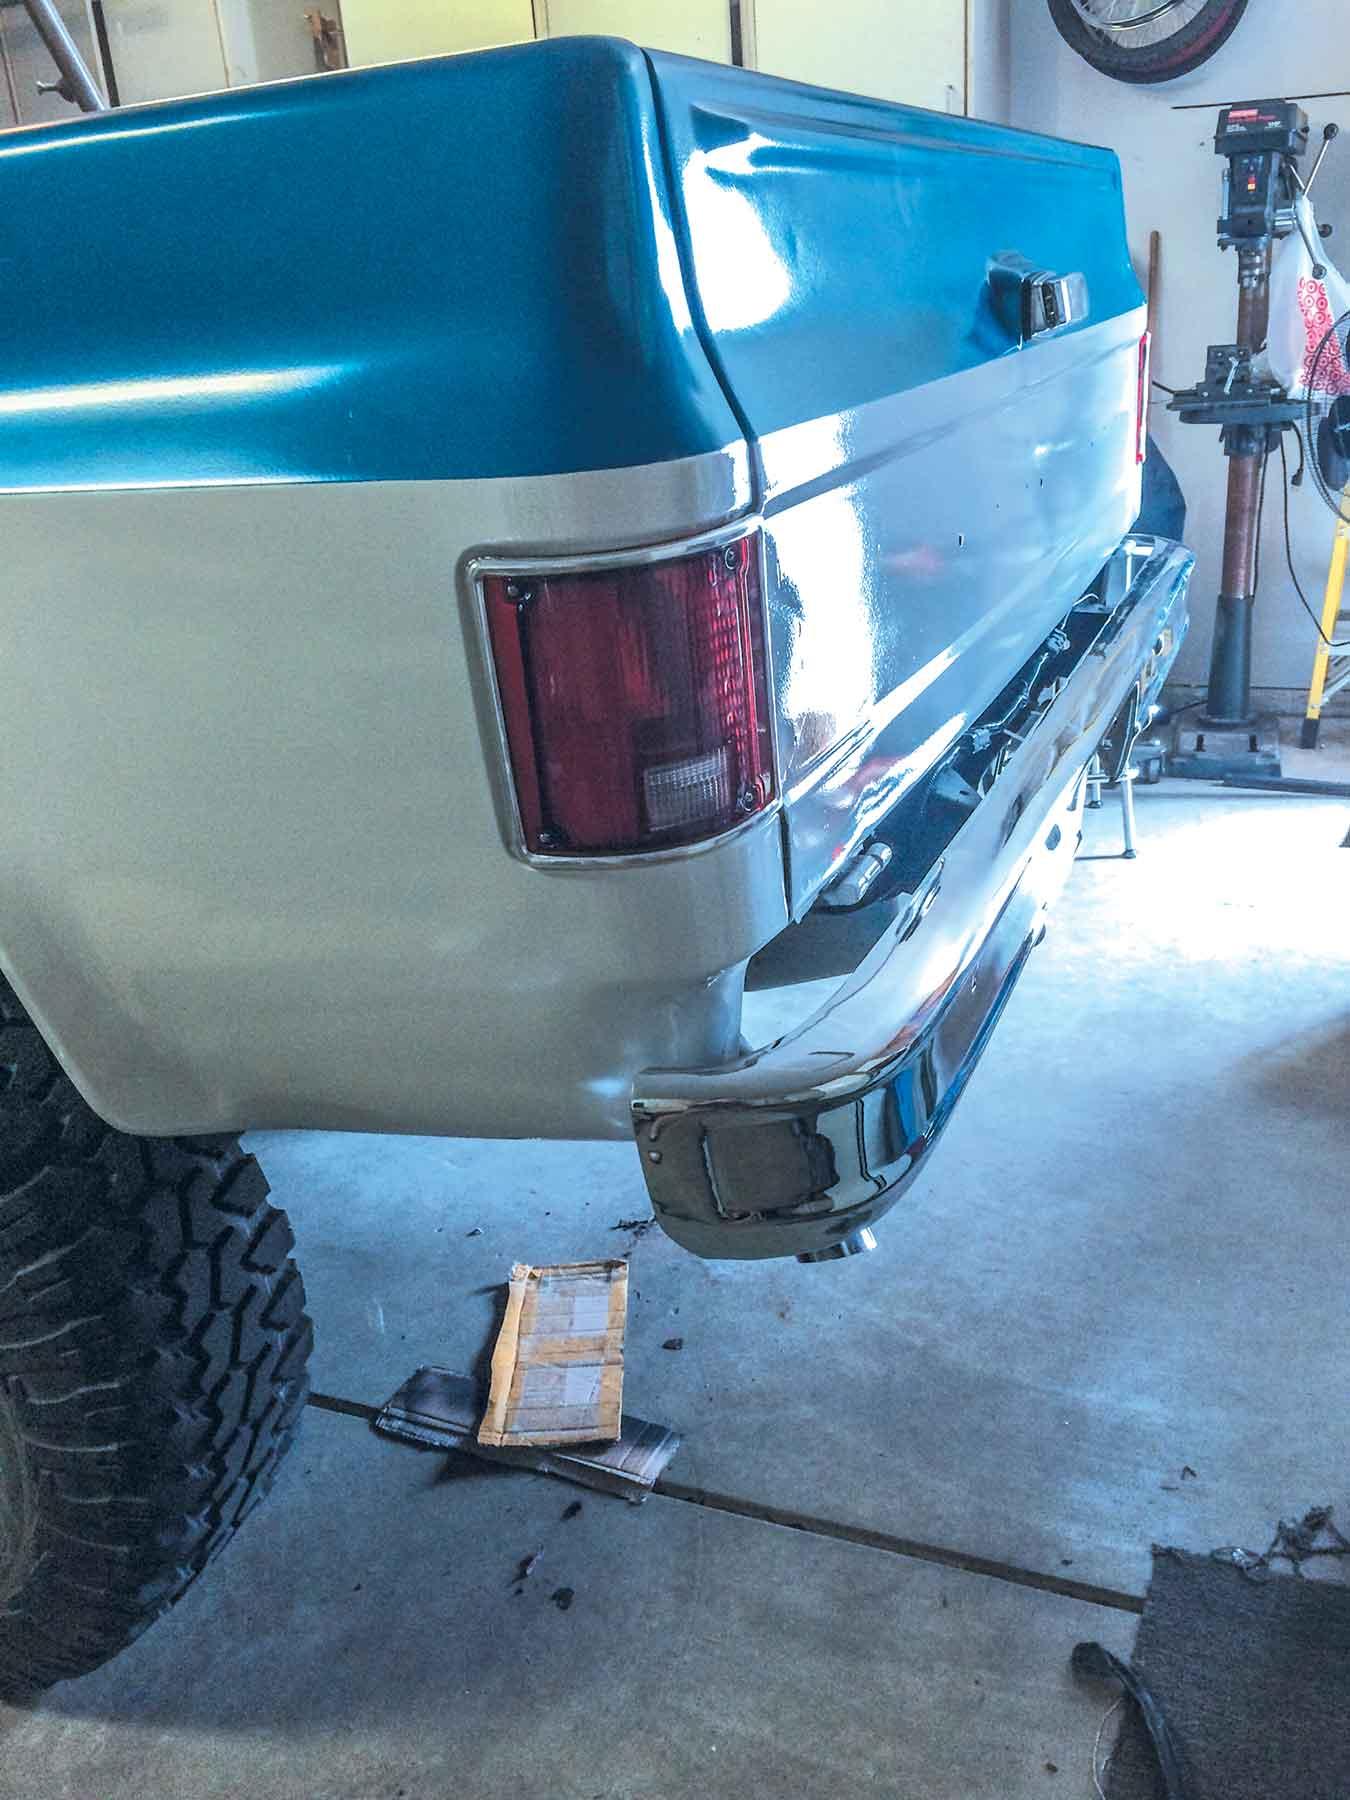 K5 Blazer Tail Light Free Download Wiring Diagrams Husqvarna Rz 4615 Diagram 1973 Chevy Kylie Cereghino Lmc Truck Life 48 At Kc Lights